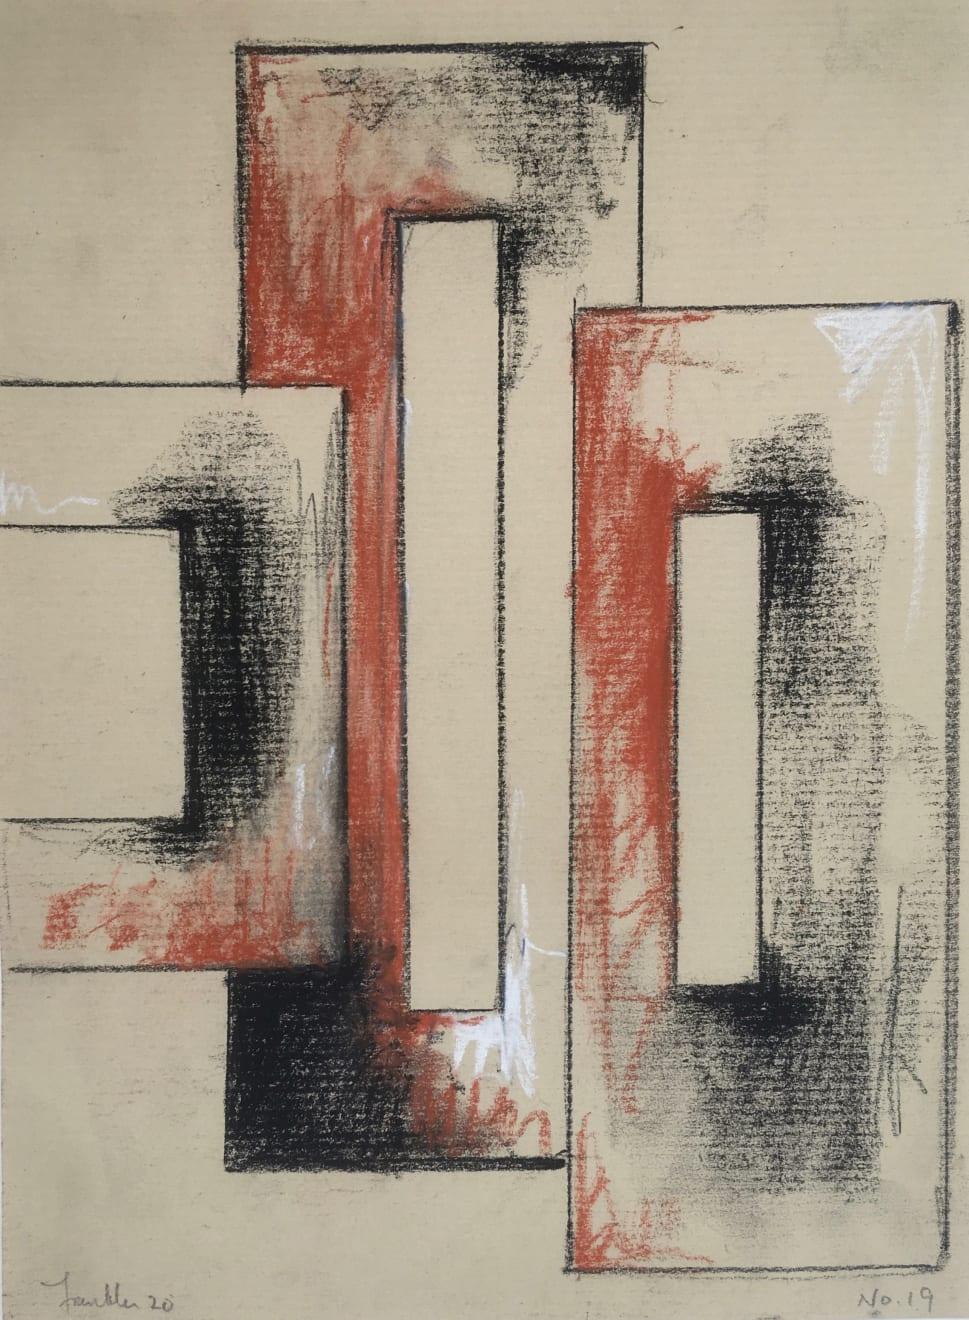 Malcolm Franklin, Tenement Sketch no.19, 2020